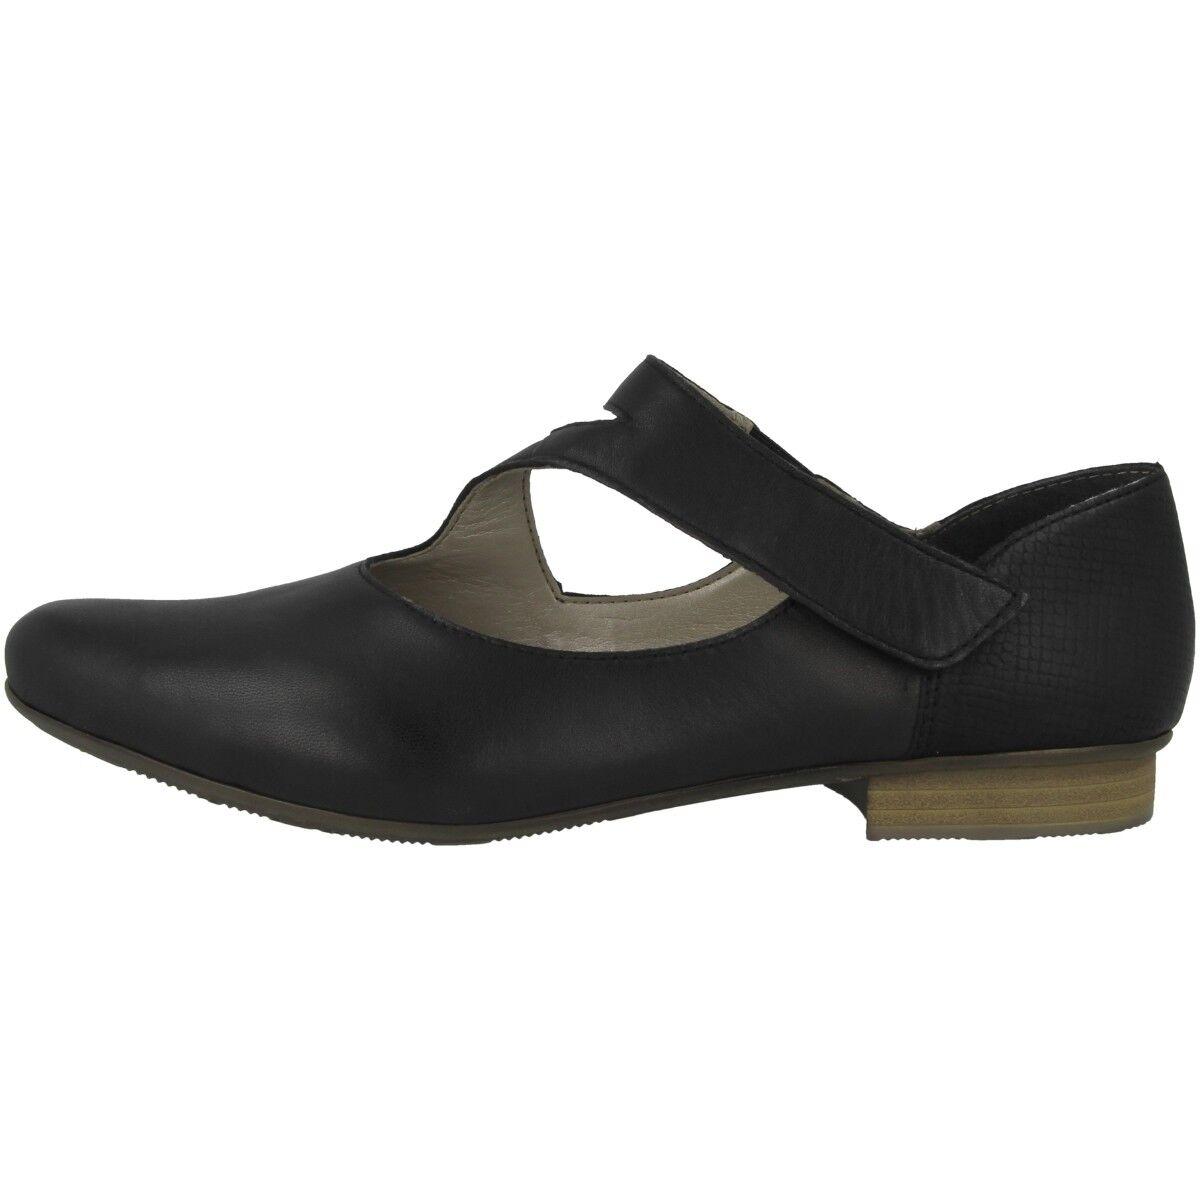 Rieker Lugano-Snake Schuhe Damen Ballerinas Halbschuhe Antistress schwarz 51993-00